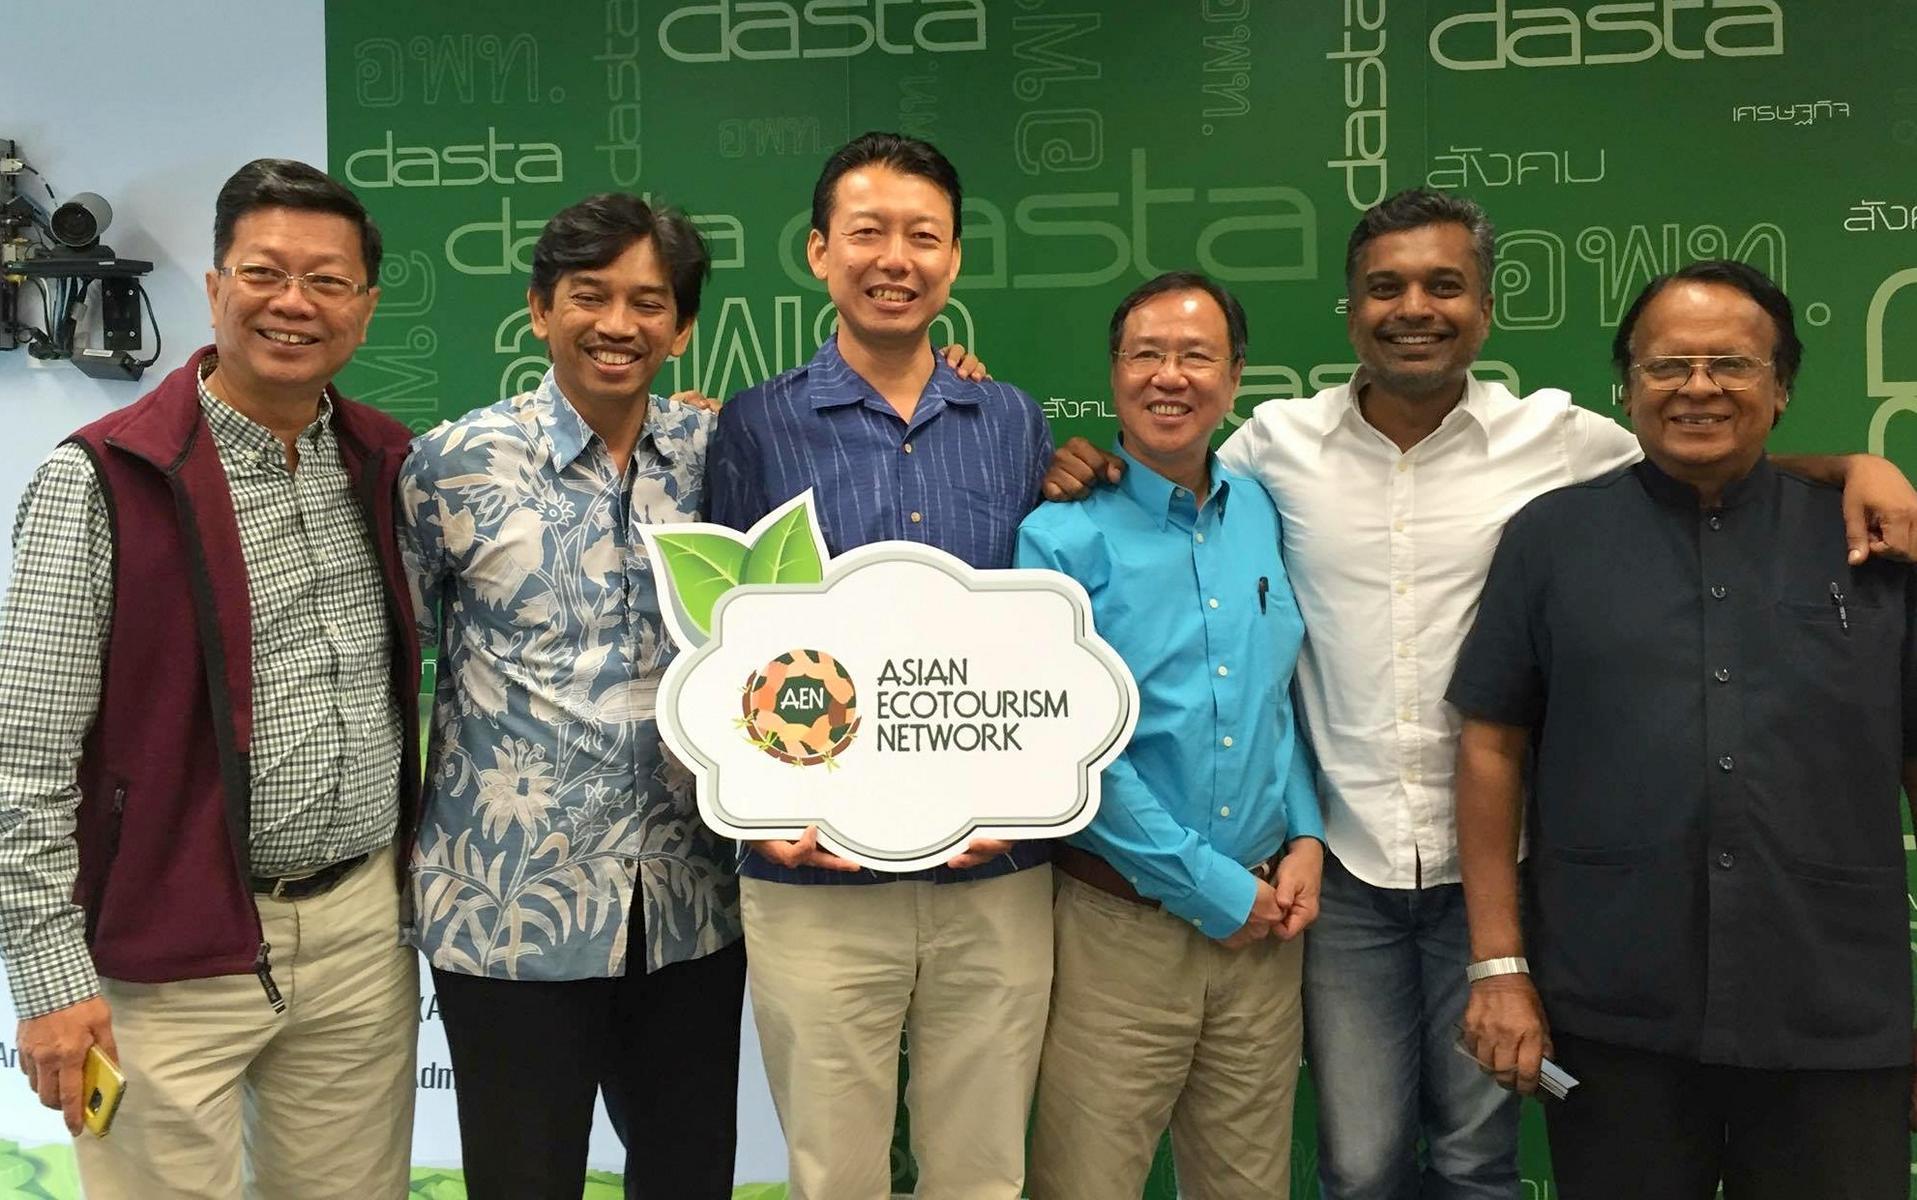 Asian Ecotourism Network board member Gopinath Parayil